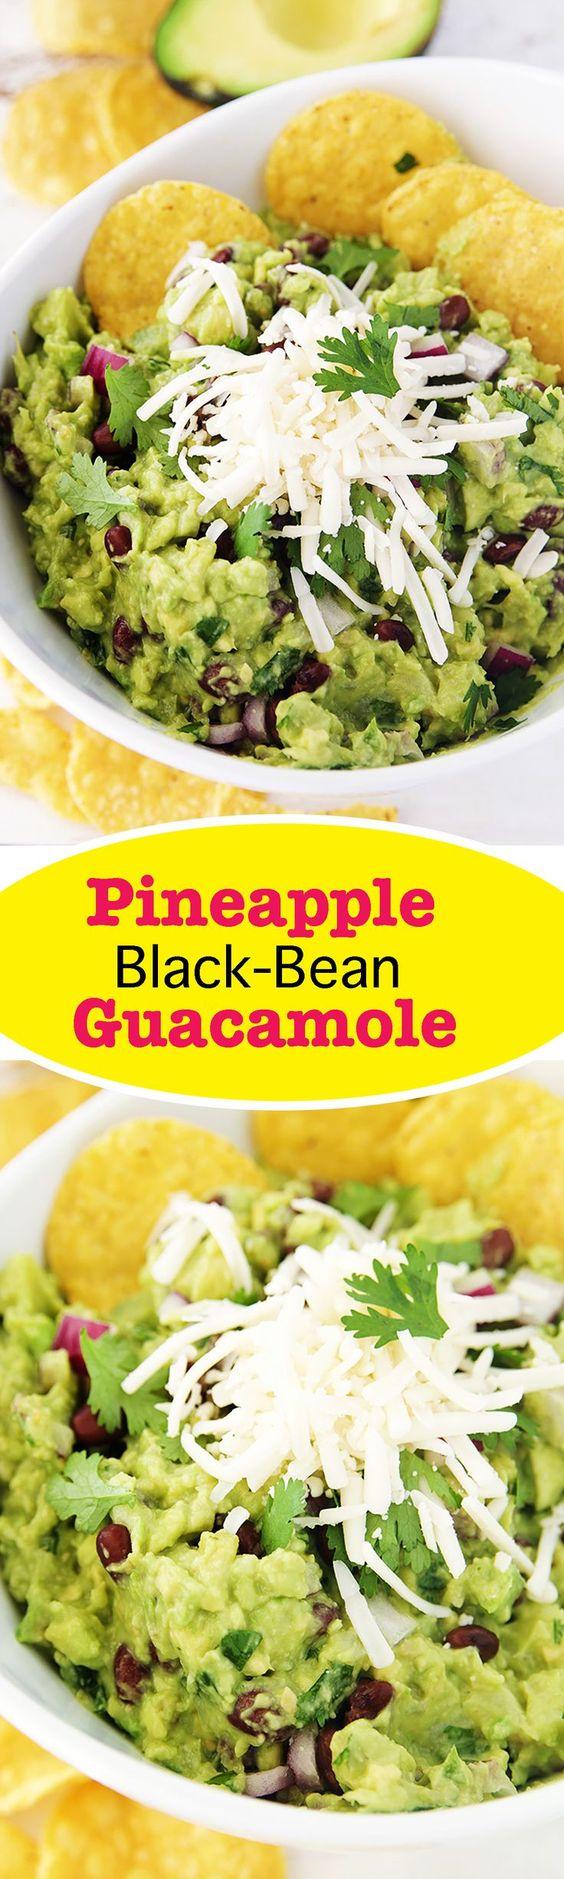 guacamole fitness bean guacamole and more guacamole black beans ...